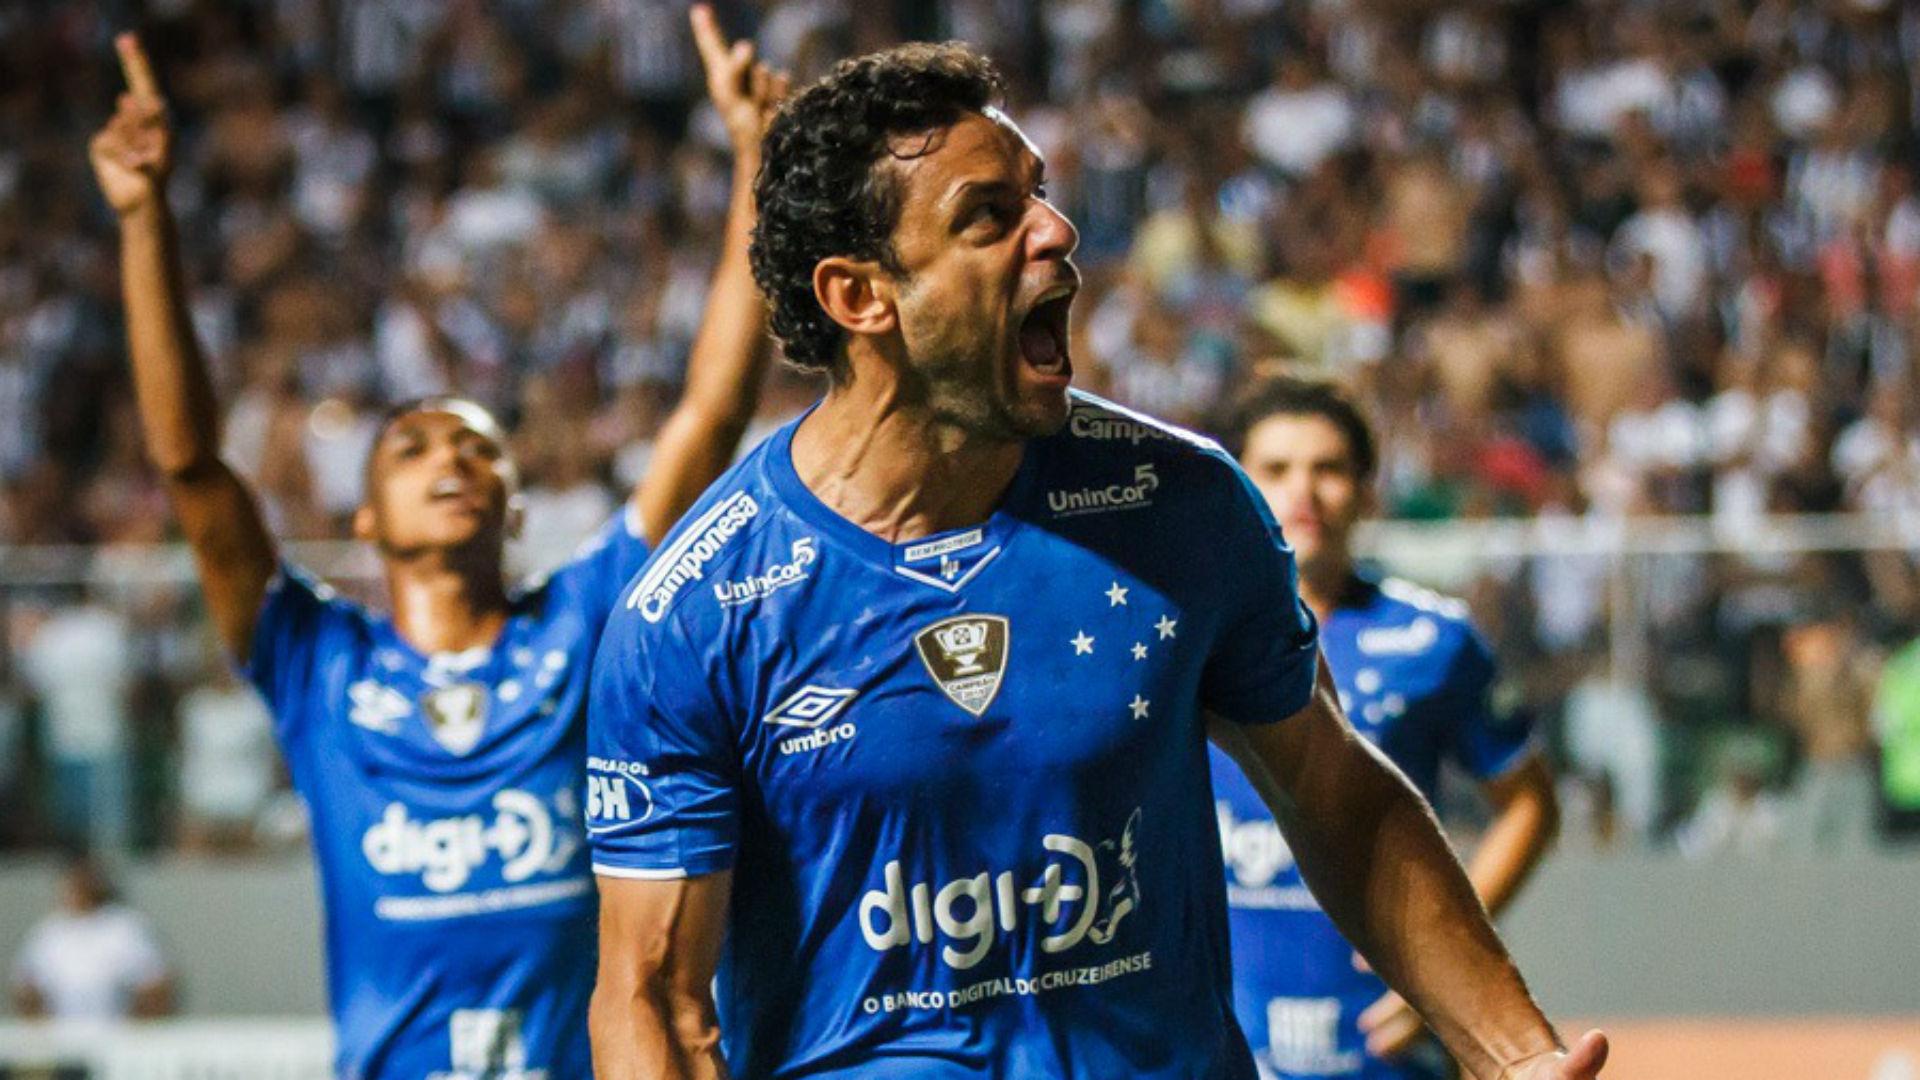 Fred  Cruzeiro Atlético final Mineiro 20 04 2019